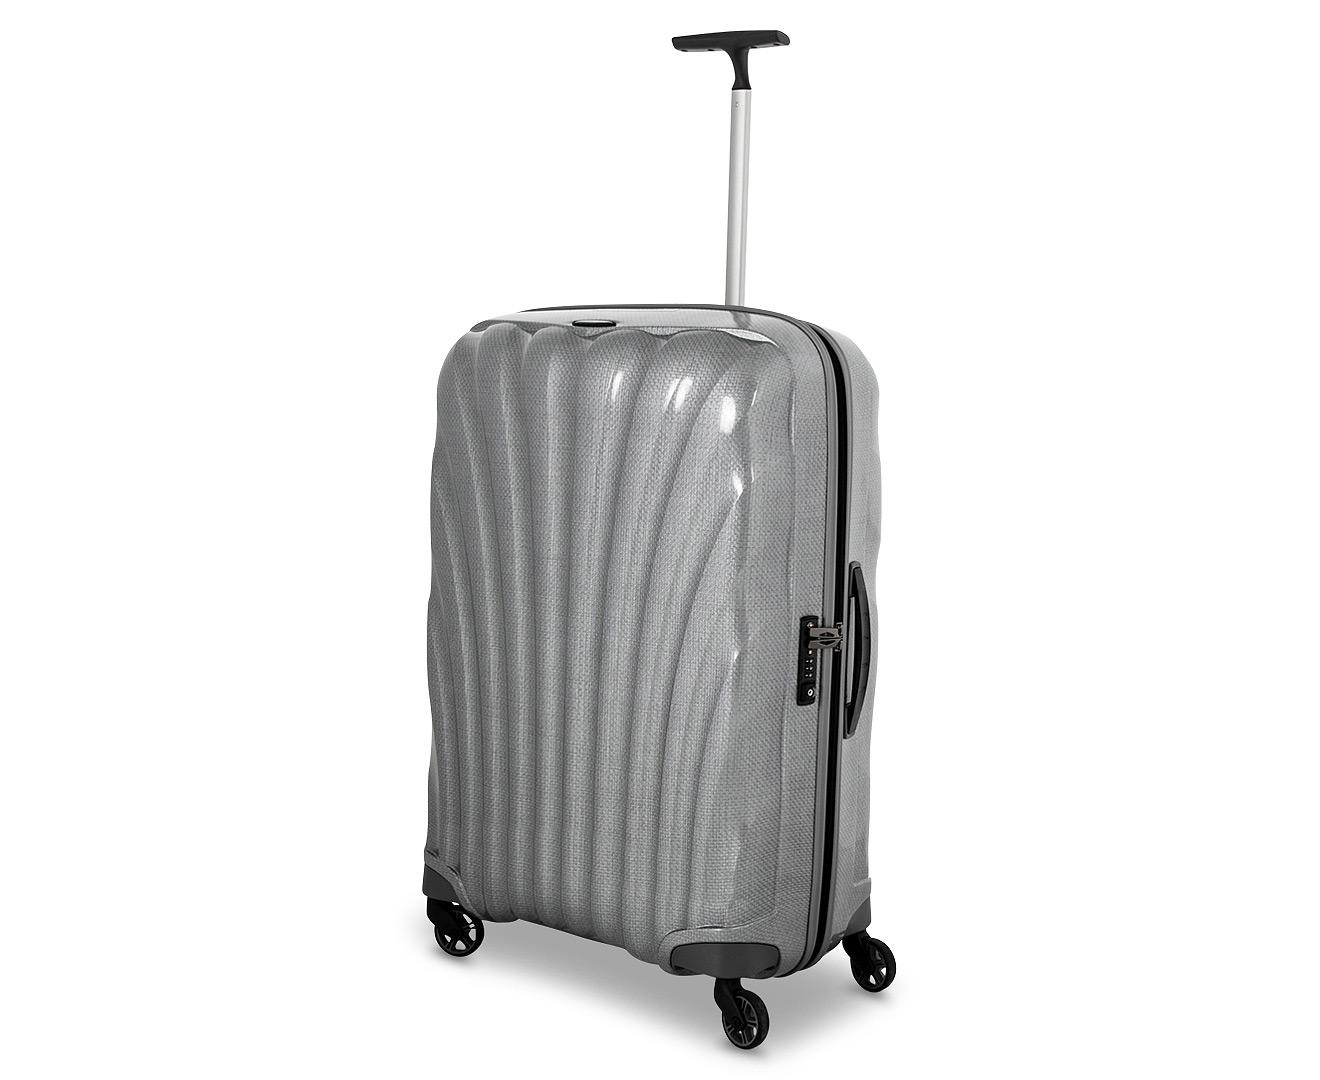 86774a0b438 Samsonite Cosmolite 3.0 Spinner 75cm FL2 Hardcase - Silver | Catch.com.au